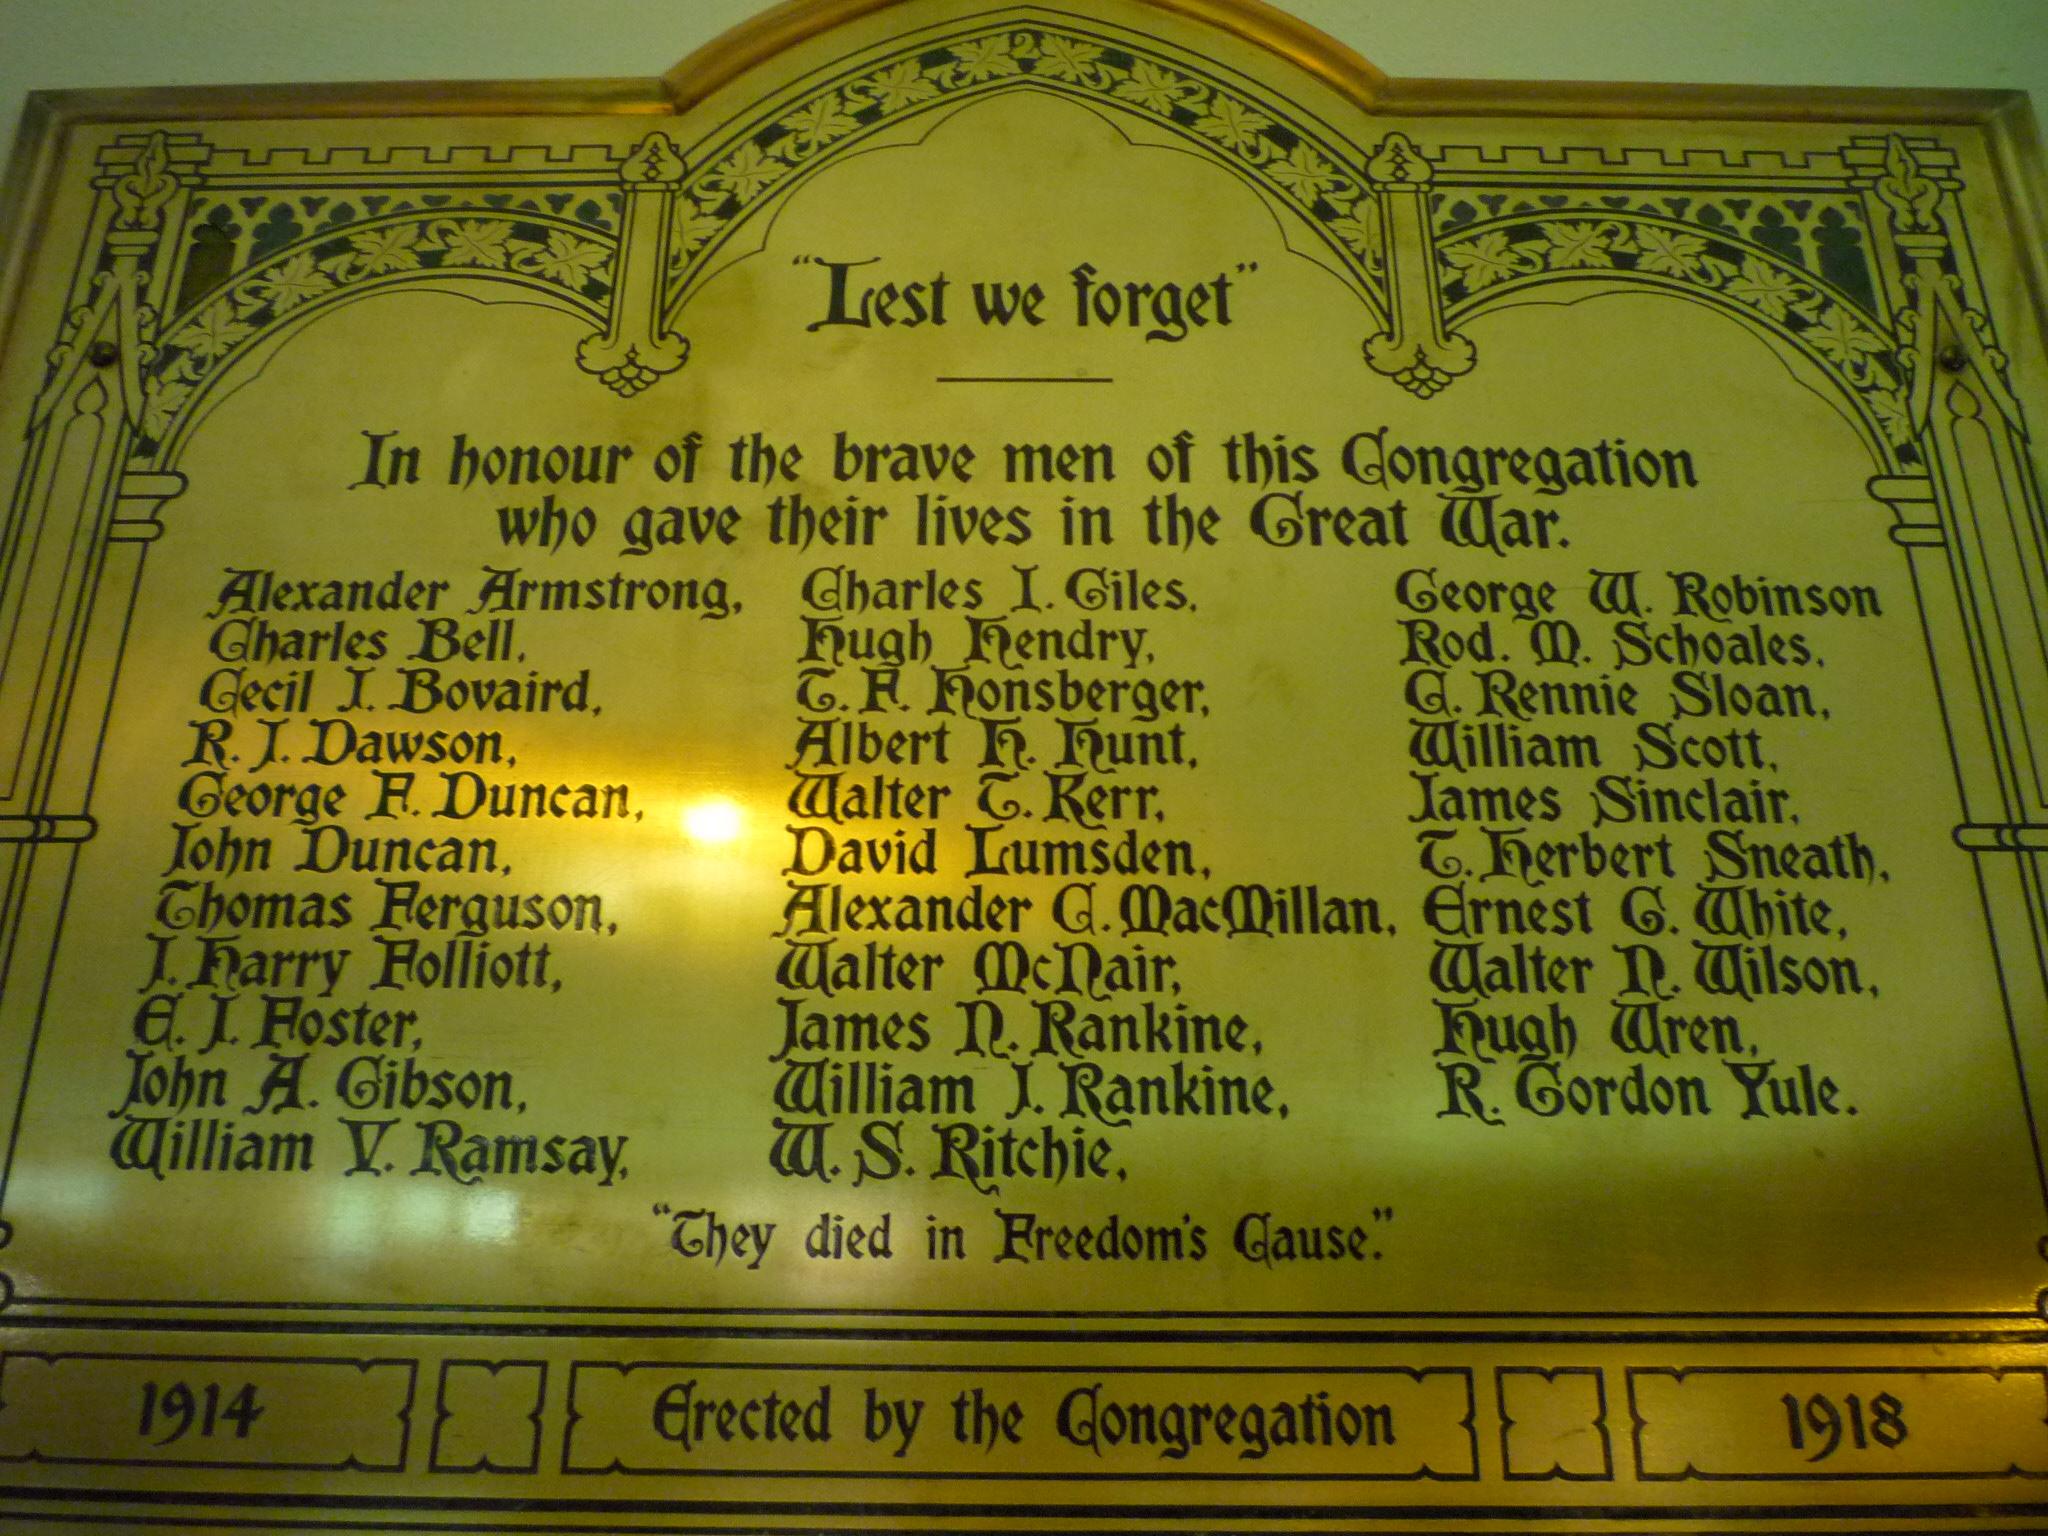 Memorial– Commemorative Plaque erected in the sanctuary of St. John's Presbyterian Church, Broadview Avenue, Toronto, Ontario, Canada.